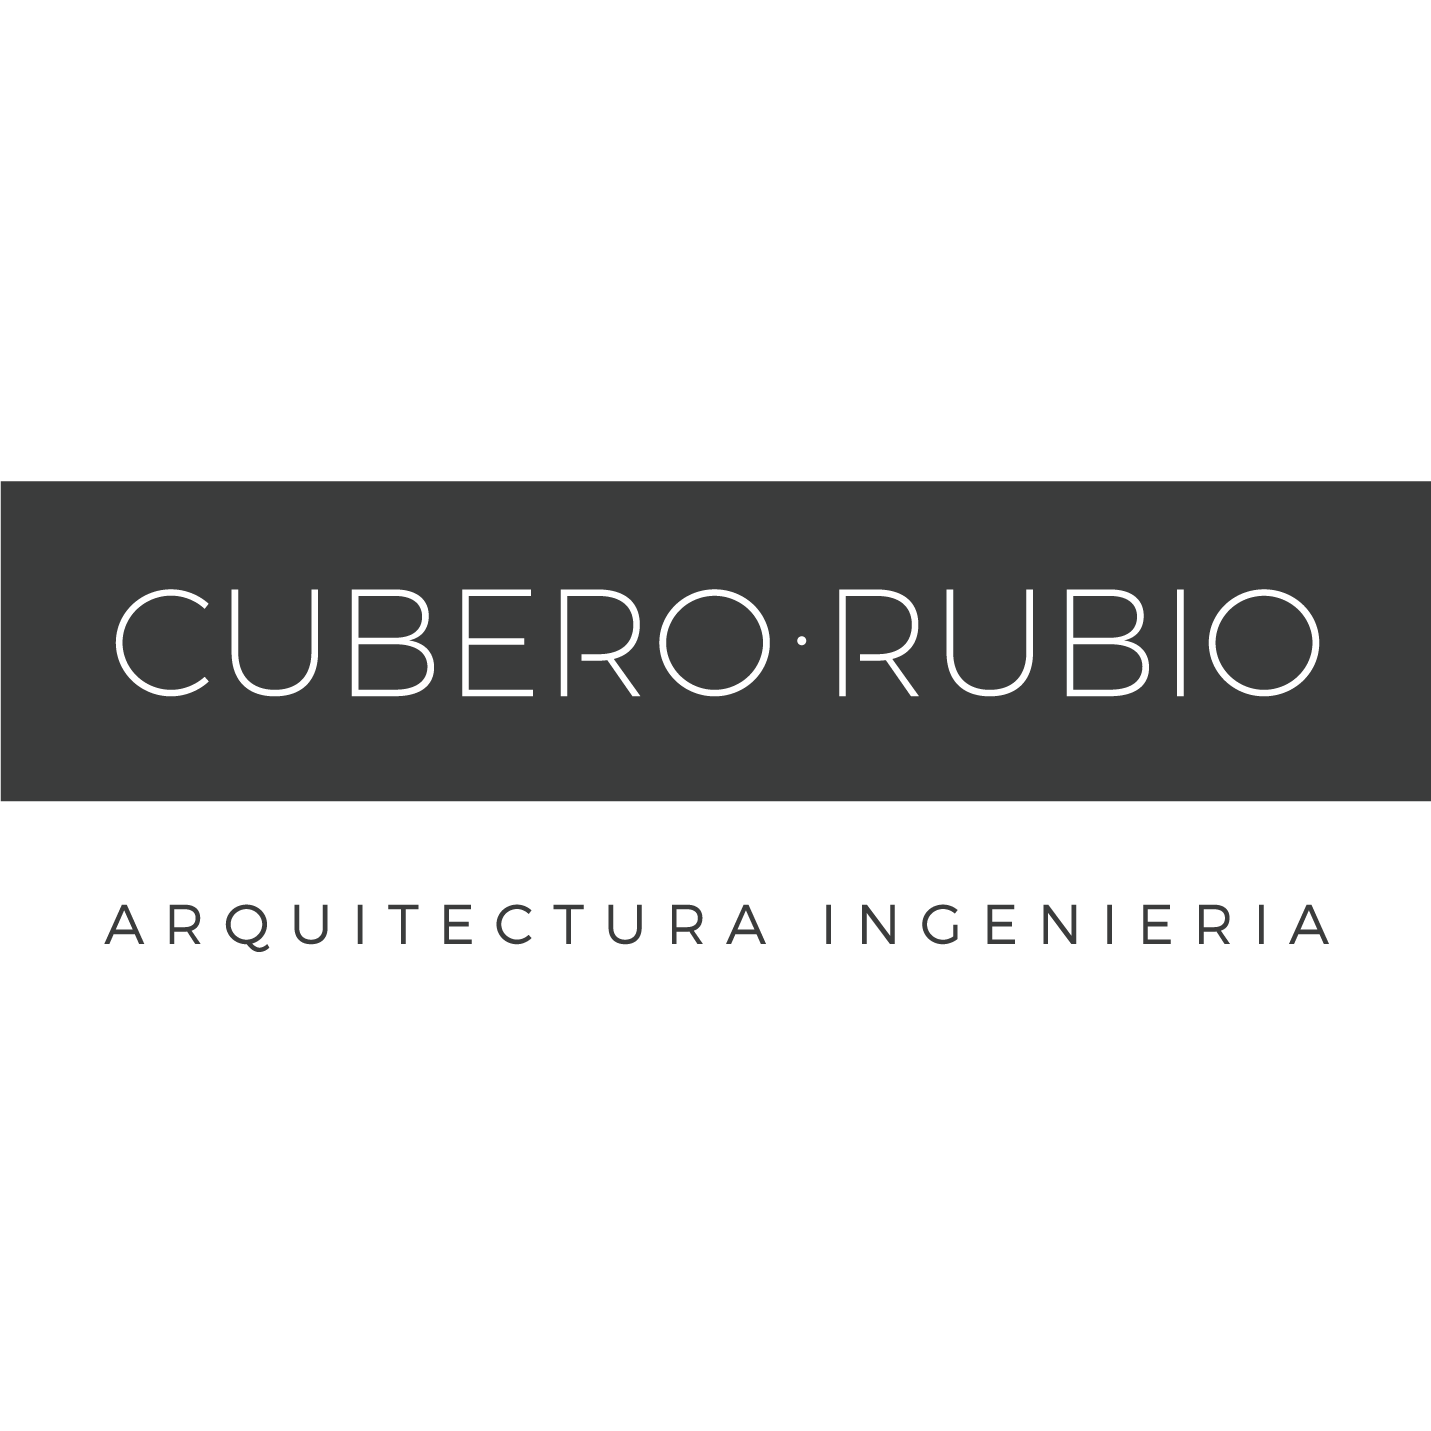 cubero-rubio.png